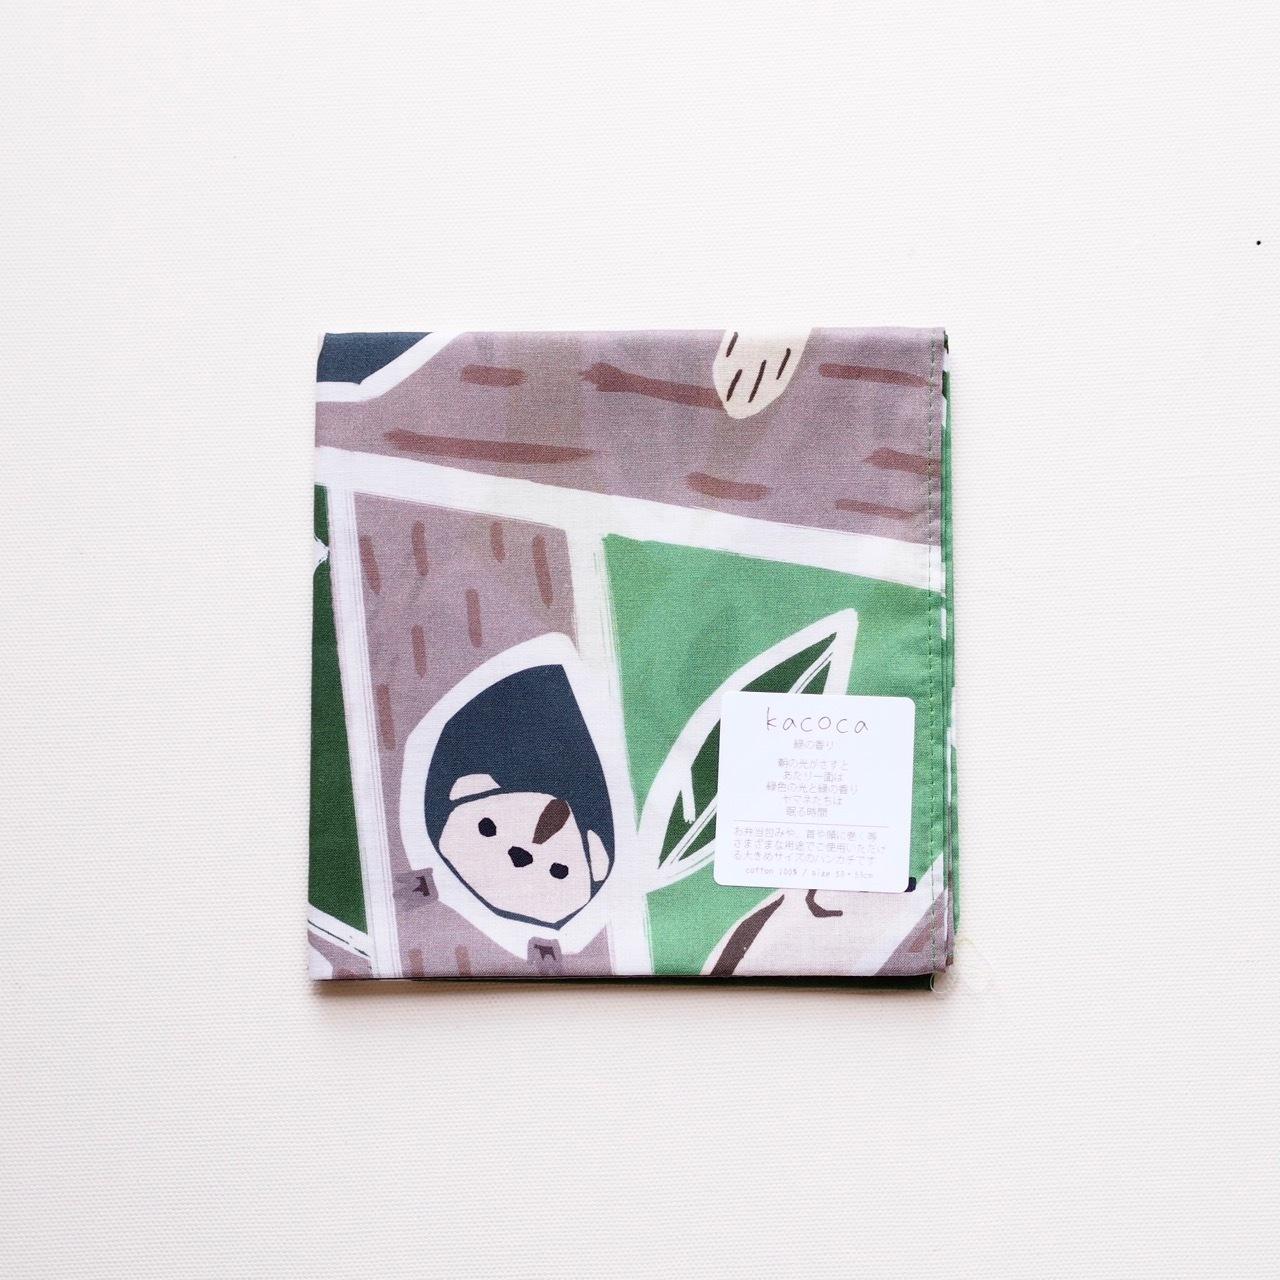 kacoca/バンダナハンカチ-緑の香り